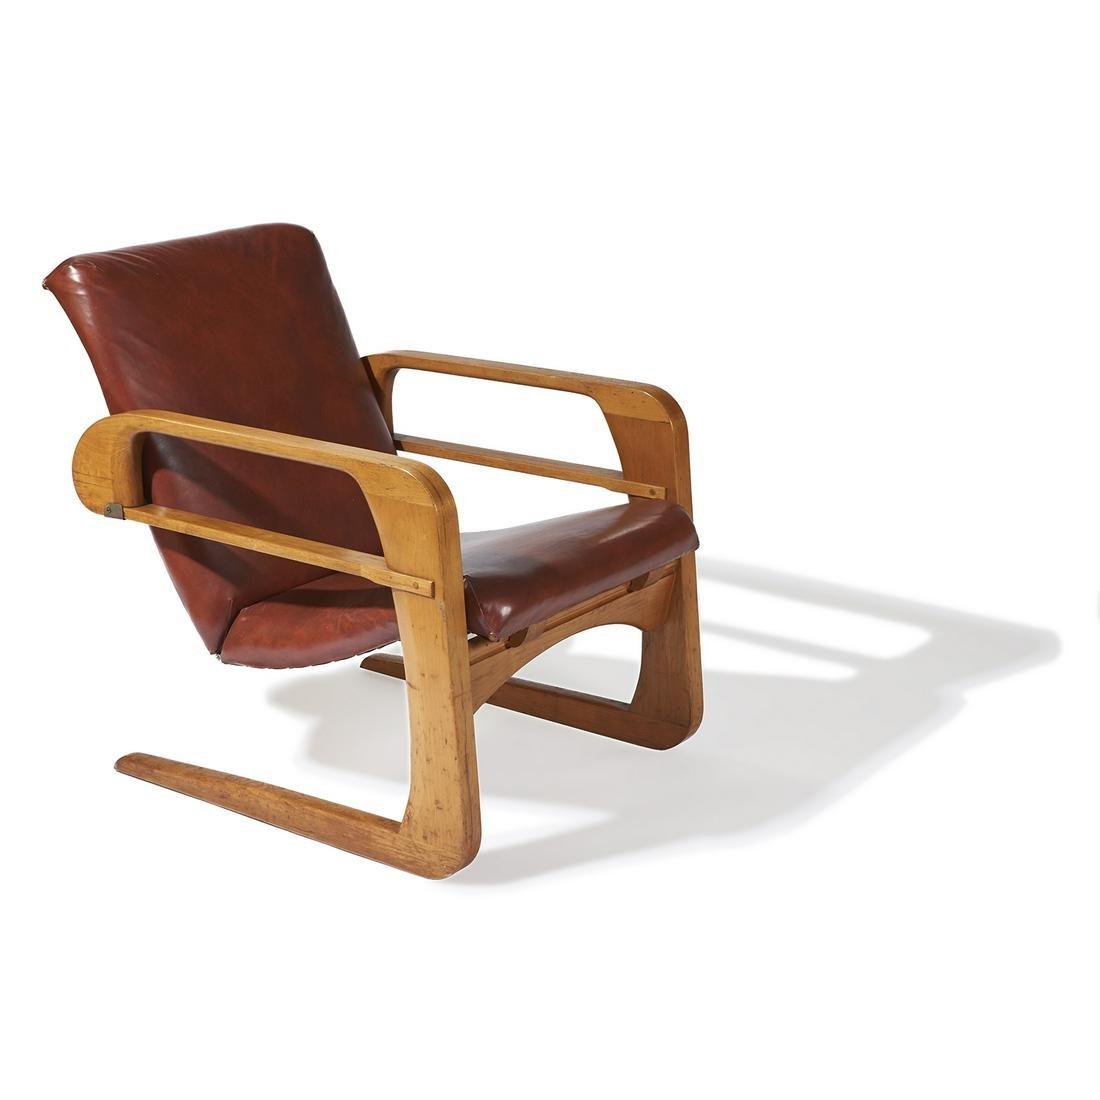 K.E.M. Weber Airline armchair